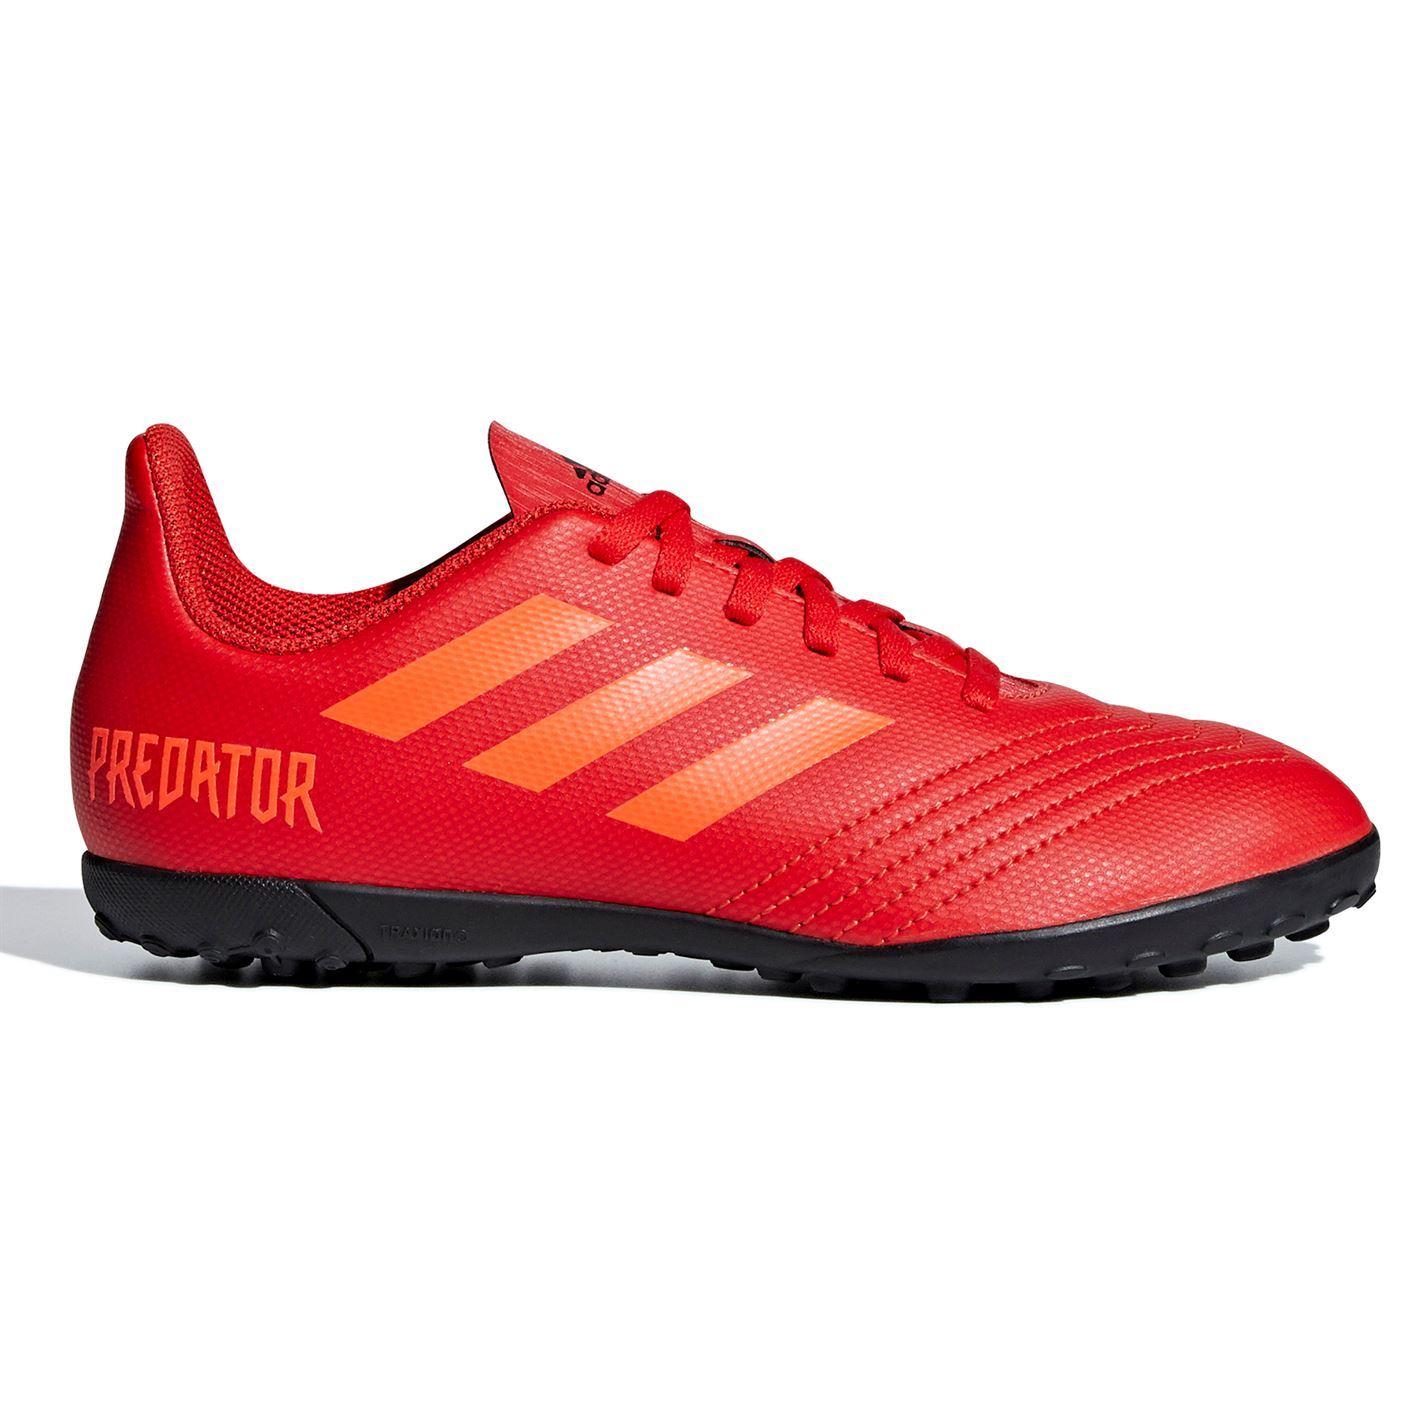 2a33107b1 ... adidas Predator 19.4 Astro Turf Football Trainers Juniors Red Soccer  Shoes ...